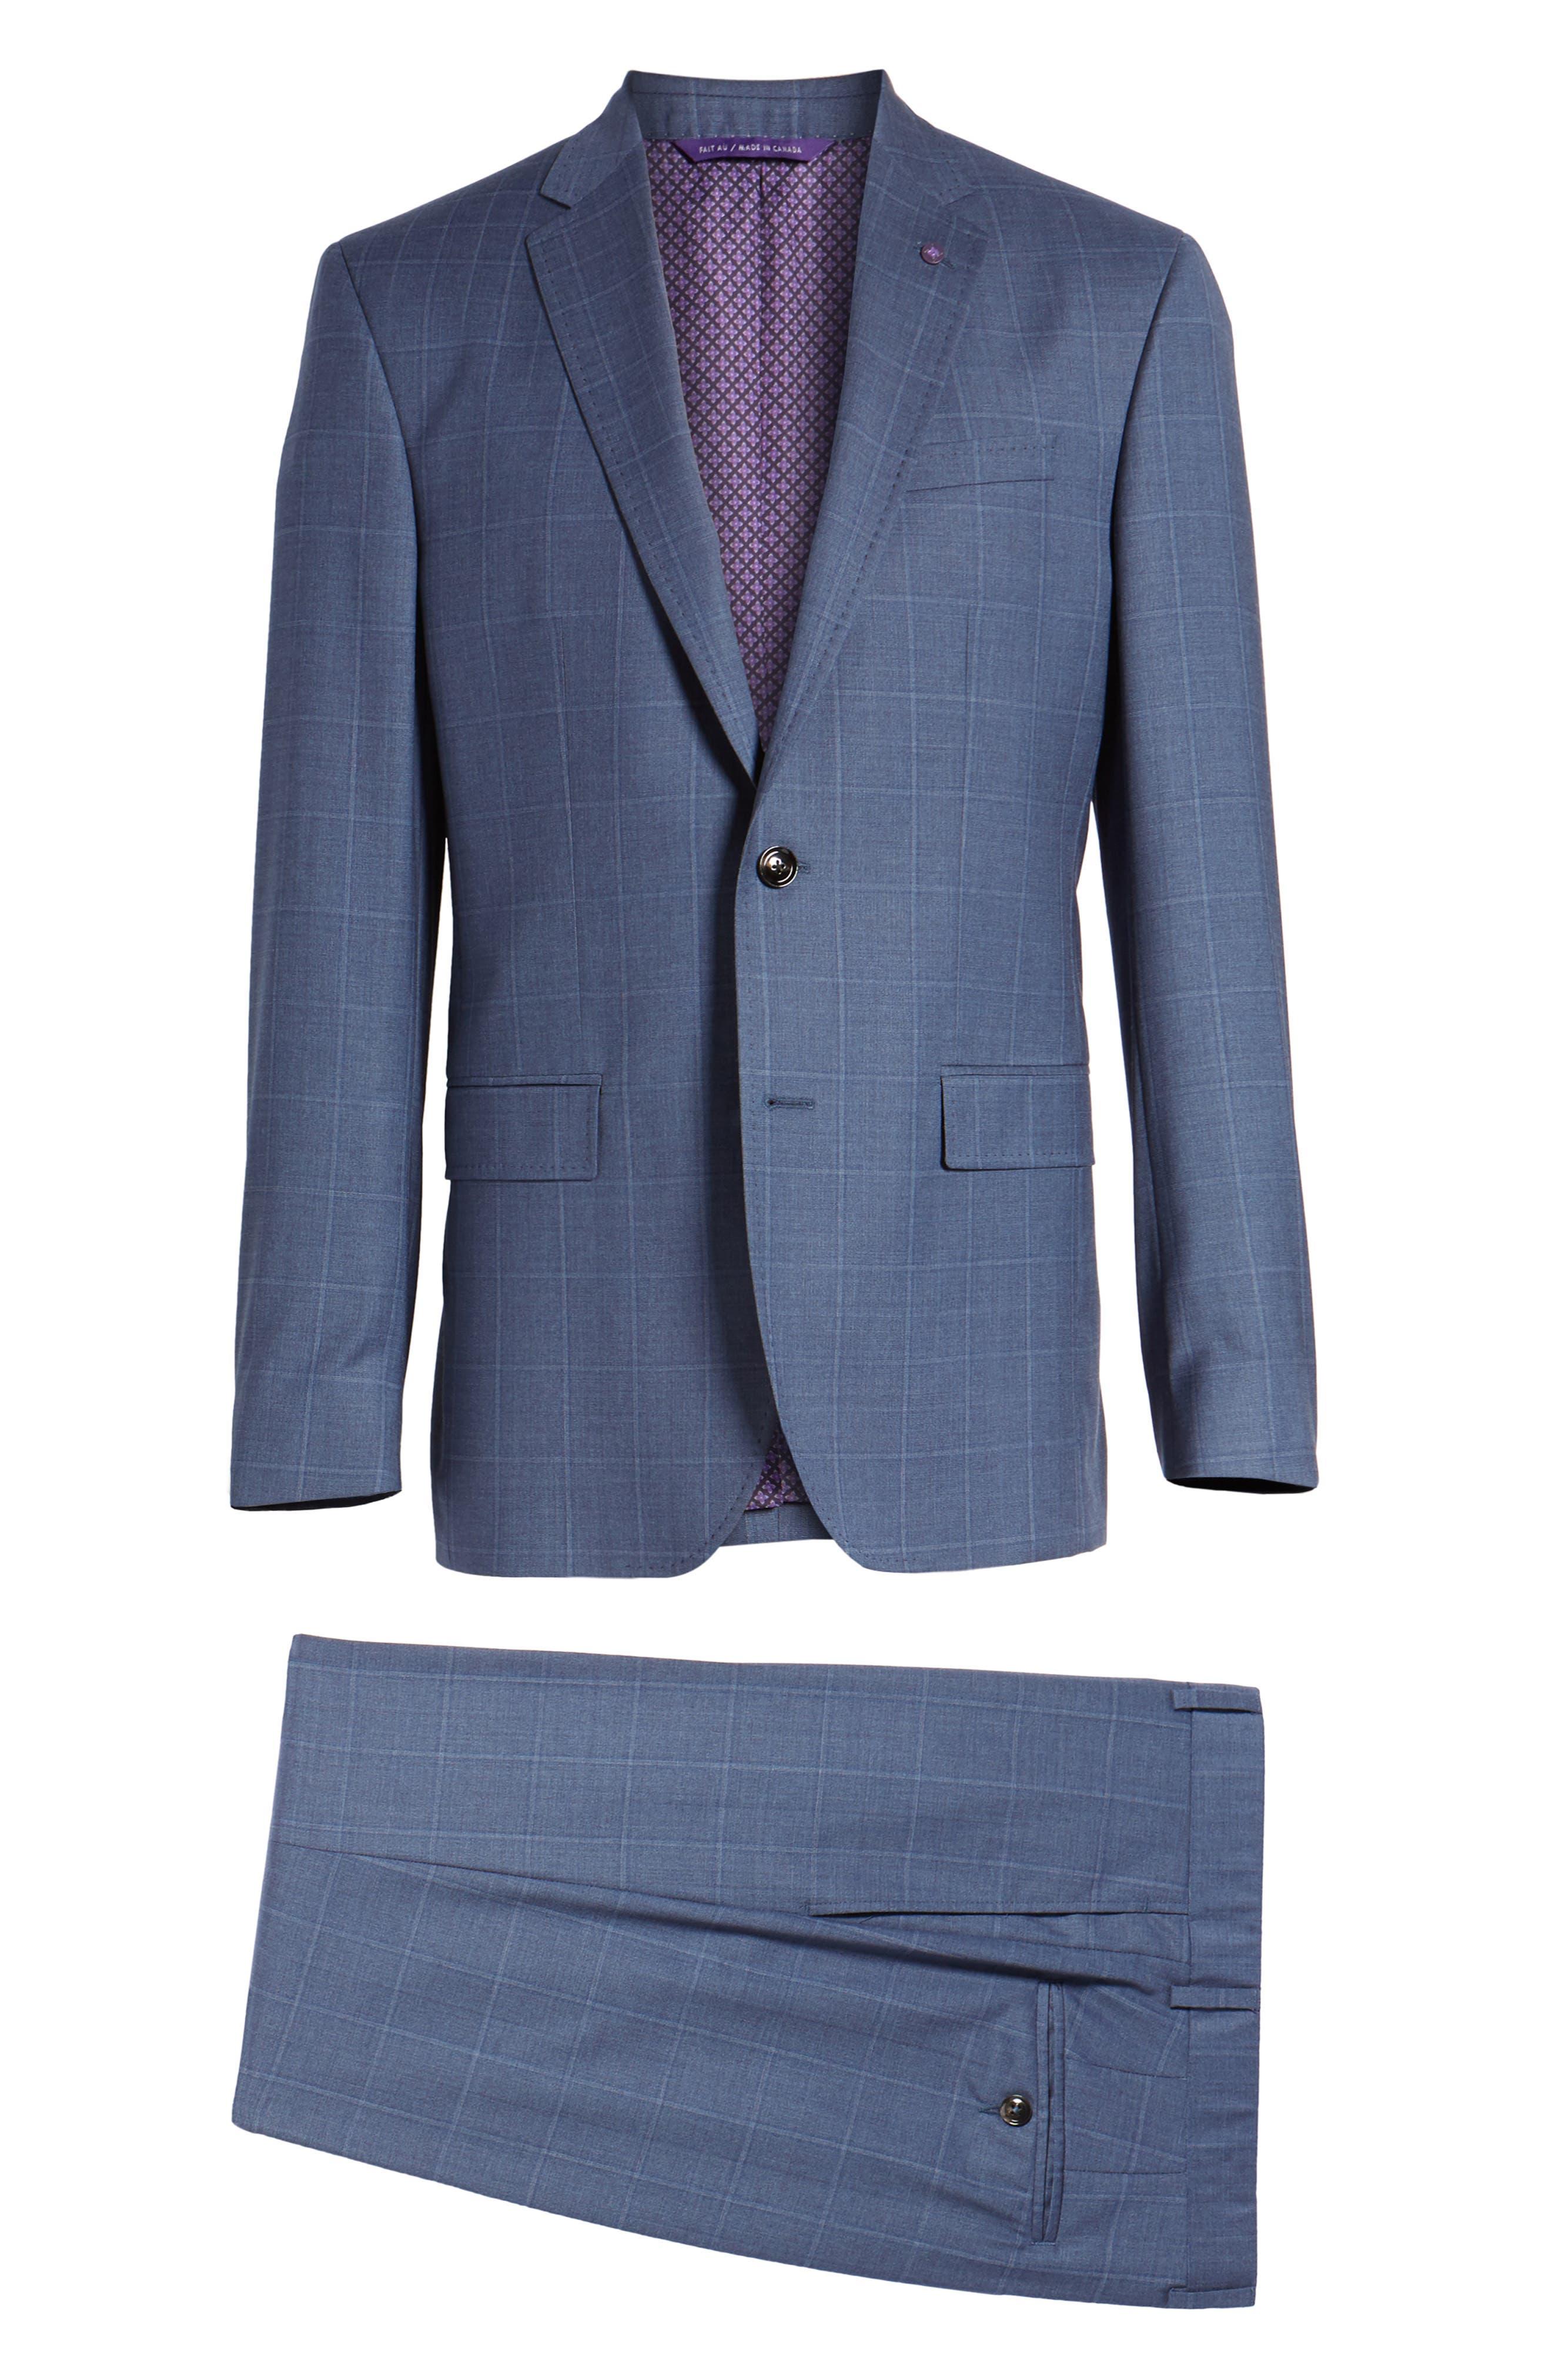 Jay Trim Fit Windowpane Wool Suit,                             Alternate thumbnail 8, color,                             Med Blue